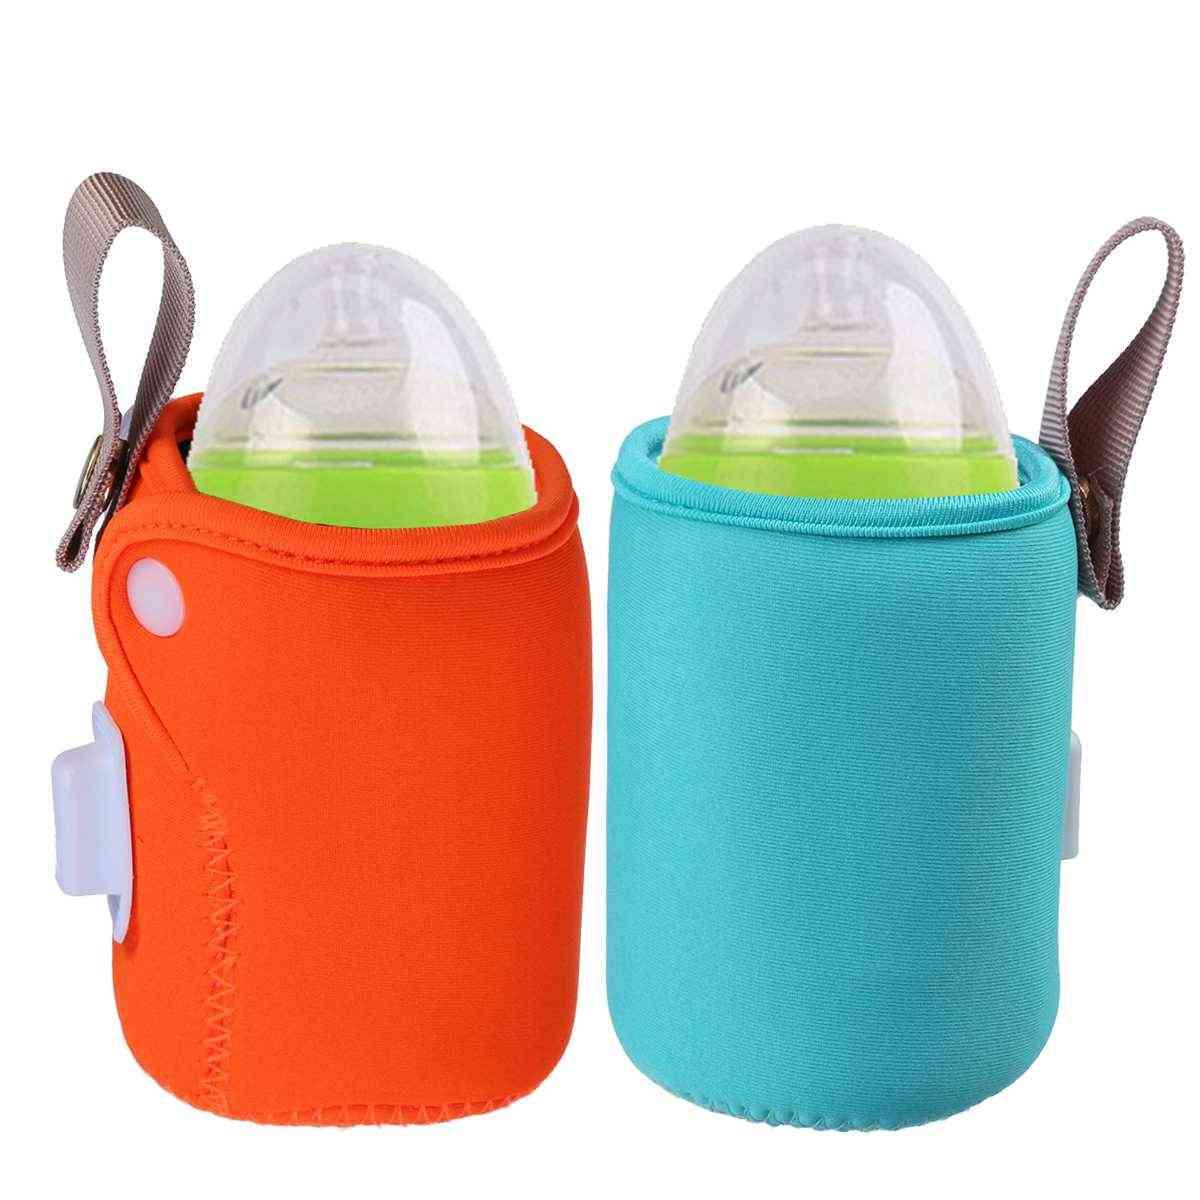 Usb Milk Warmer, Portable Travel Cup, Nursing Bottle Cover, Warmer Heater Bag